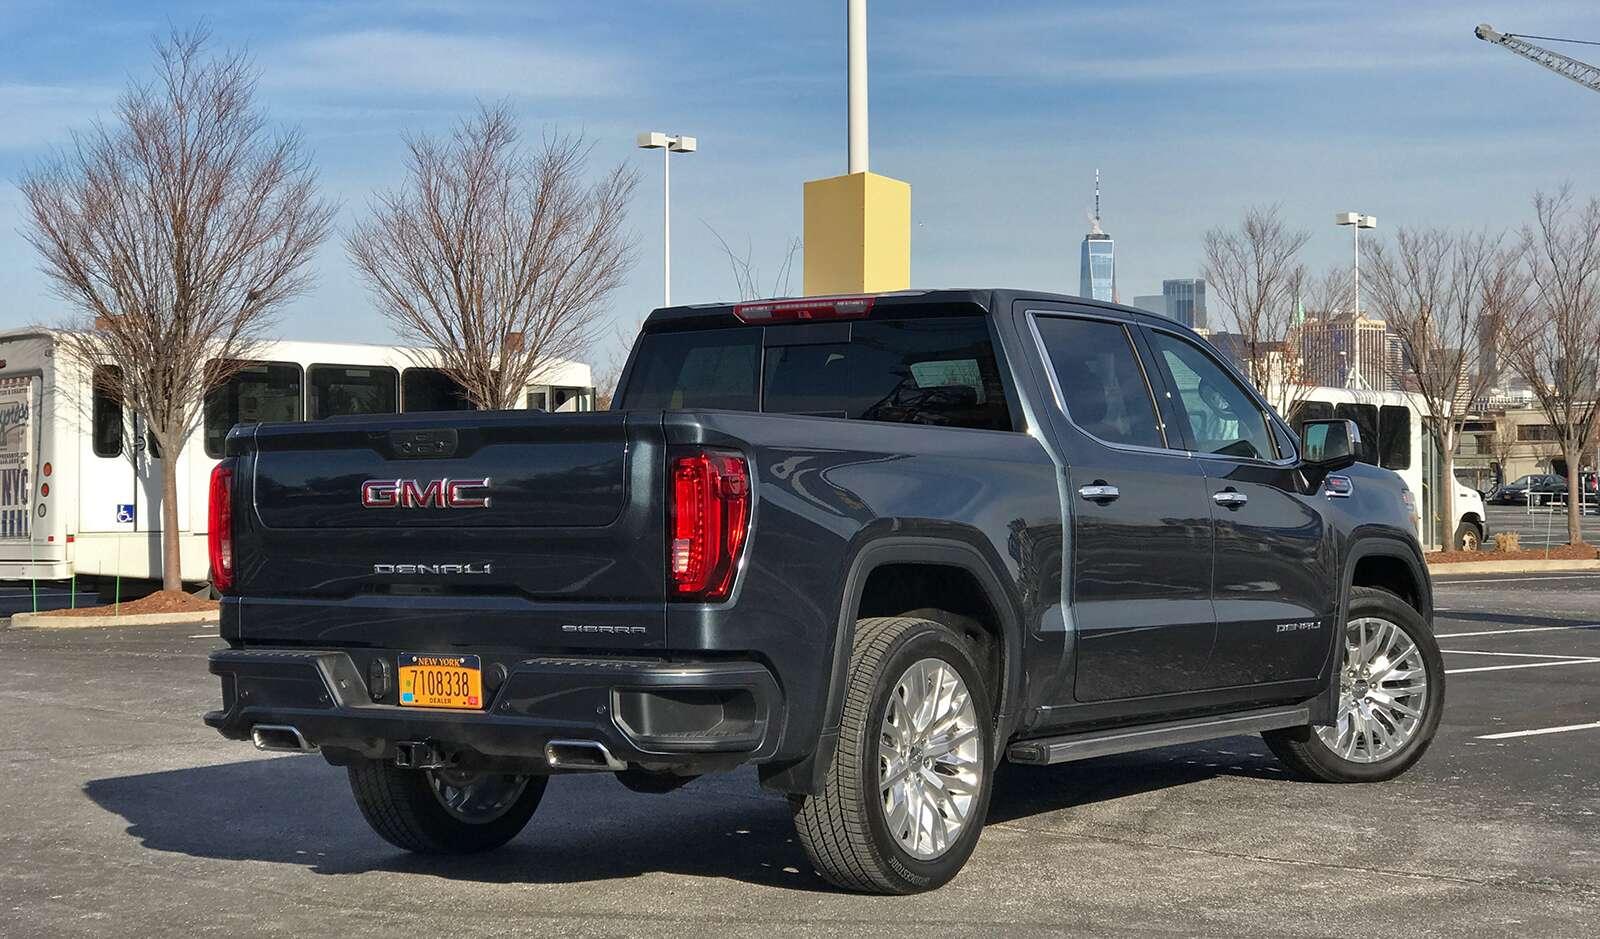 2019 GMC Sierra Denali 1500 Test Drive Review: A Nice Pickup Truck, Sure, But Not $68,000 Nice ...